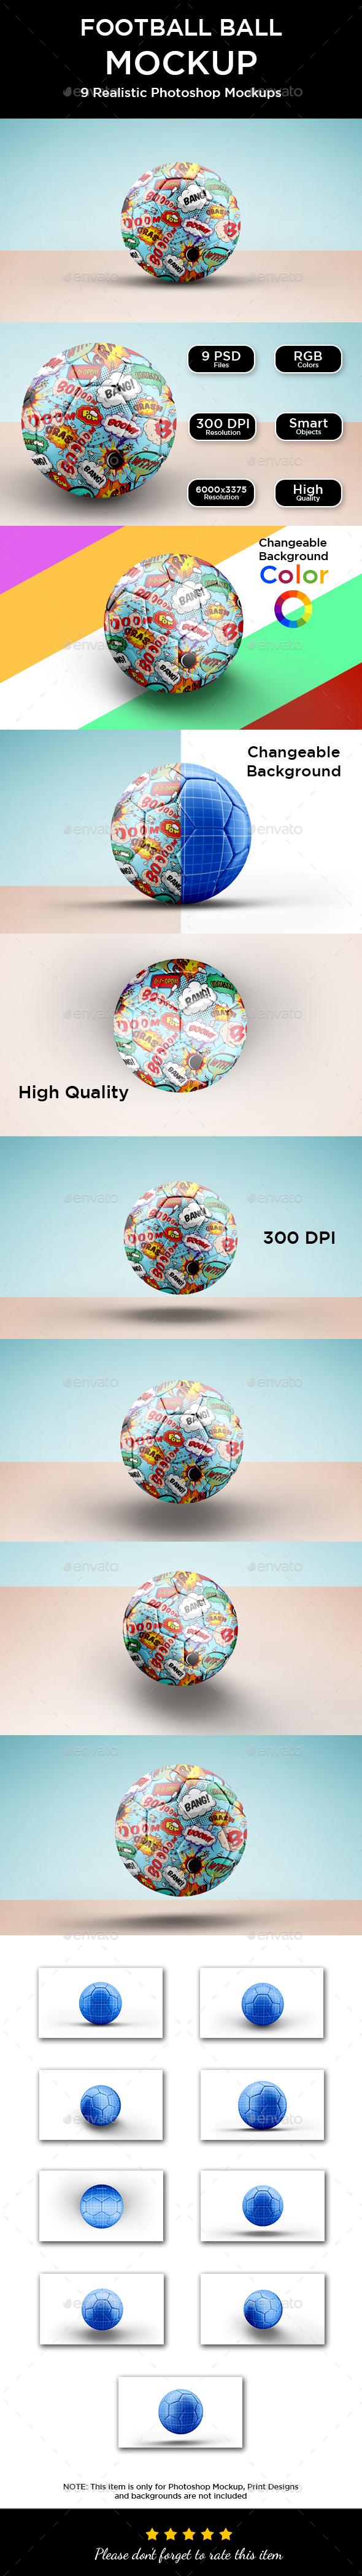 Soccer / Football Ball Mockup - Product Mock-Ups Graphics